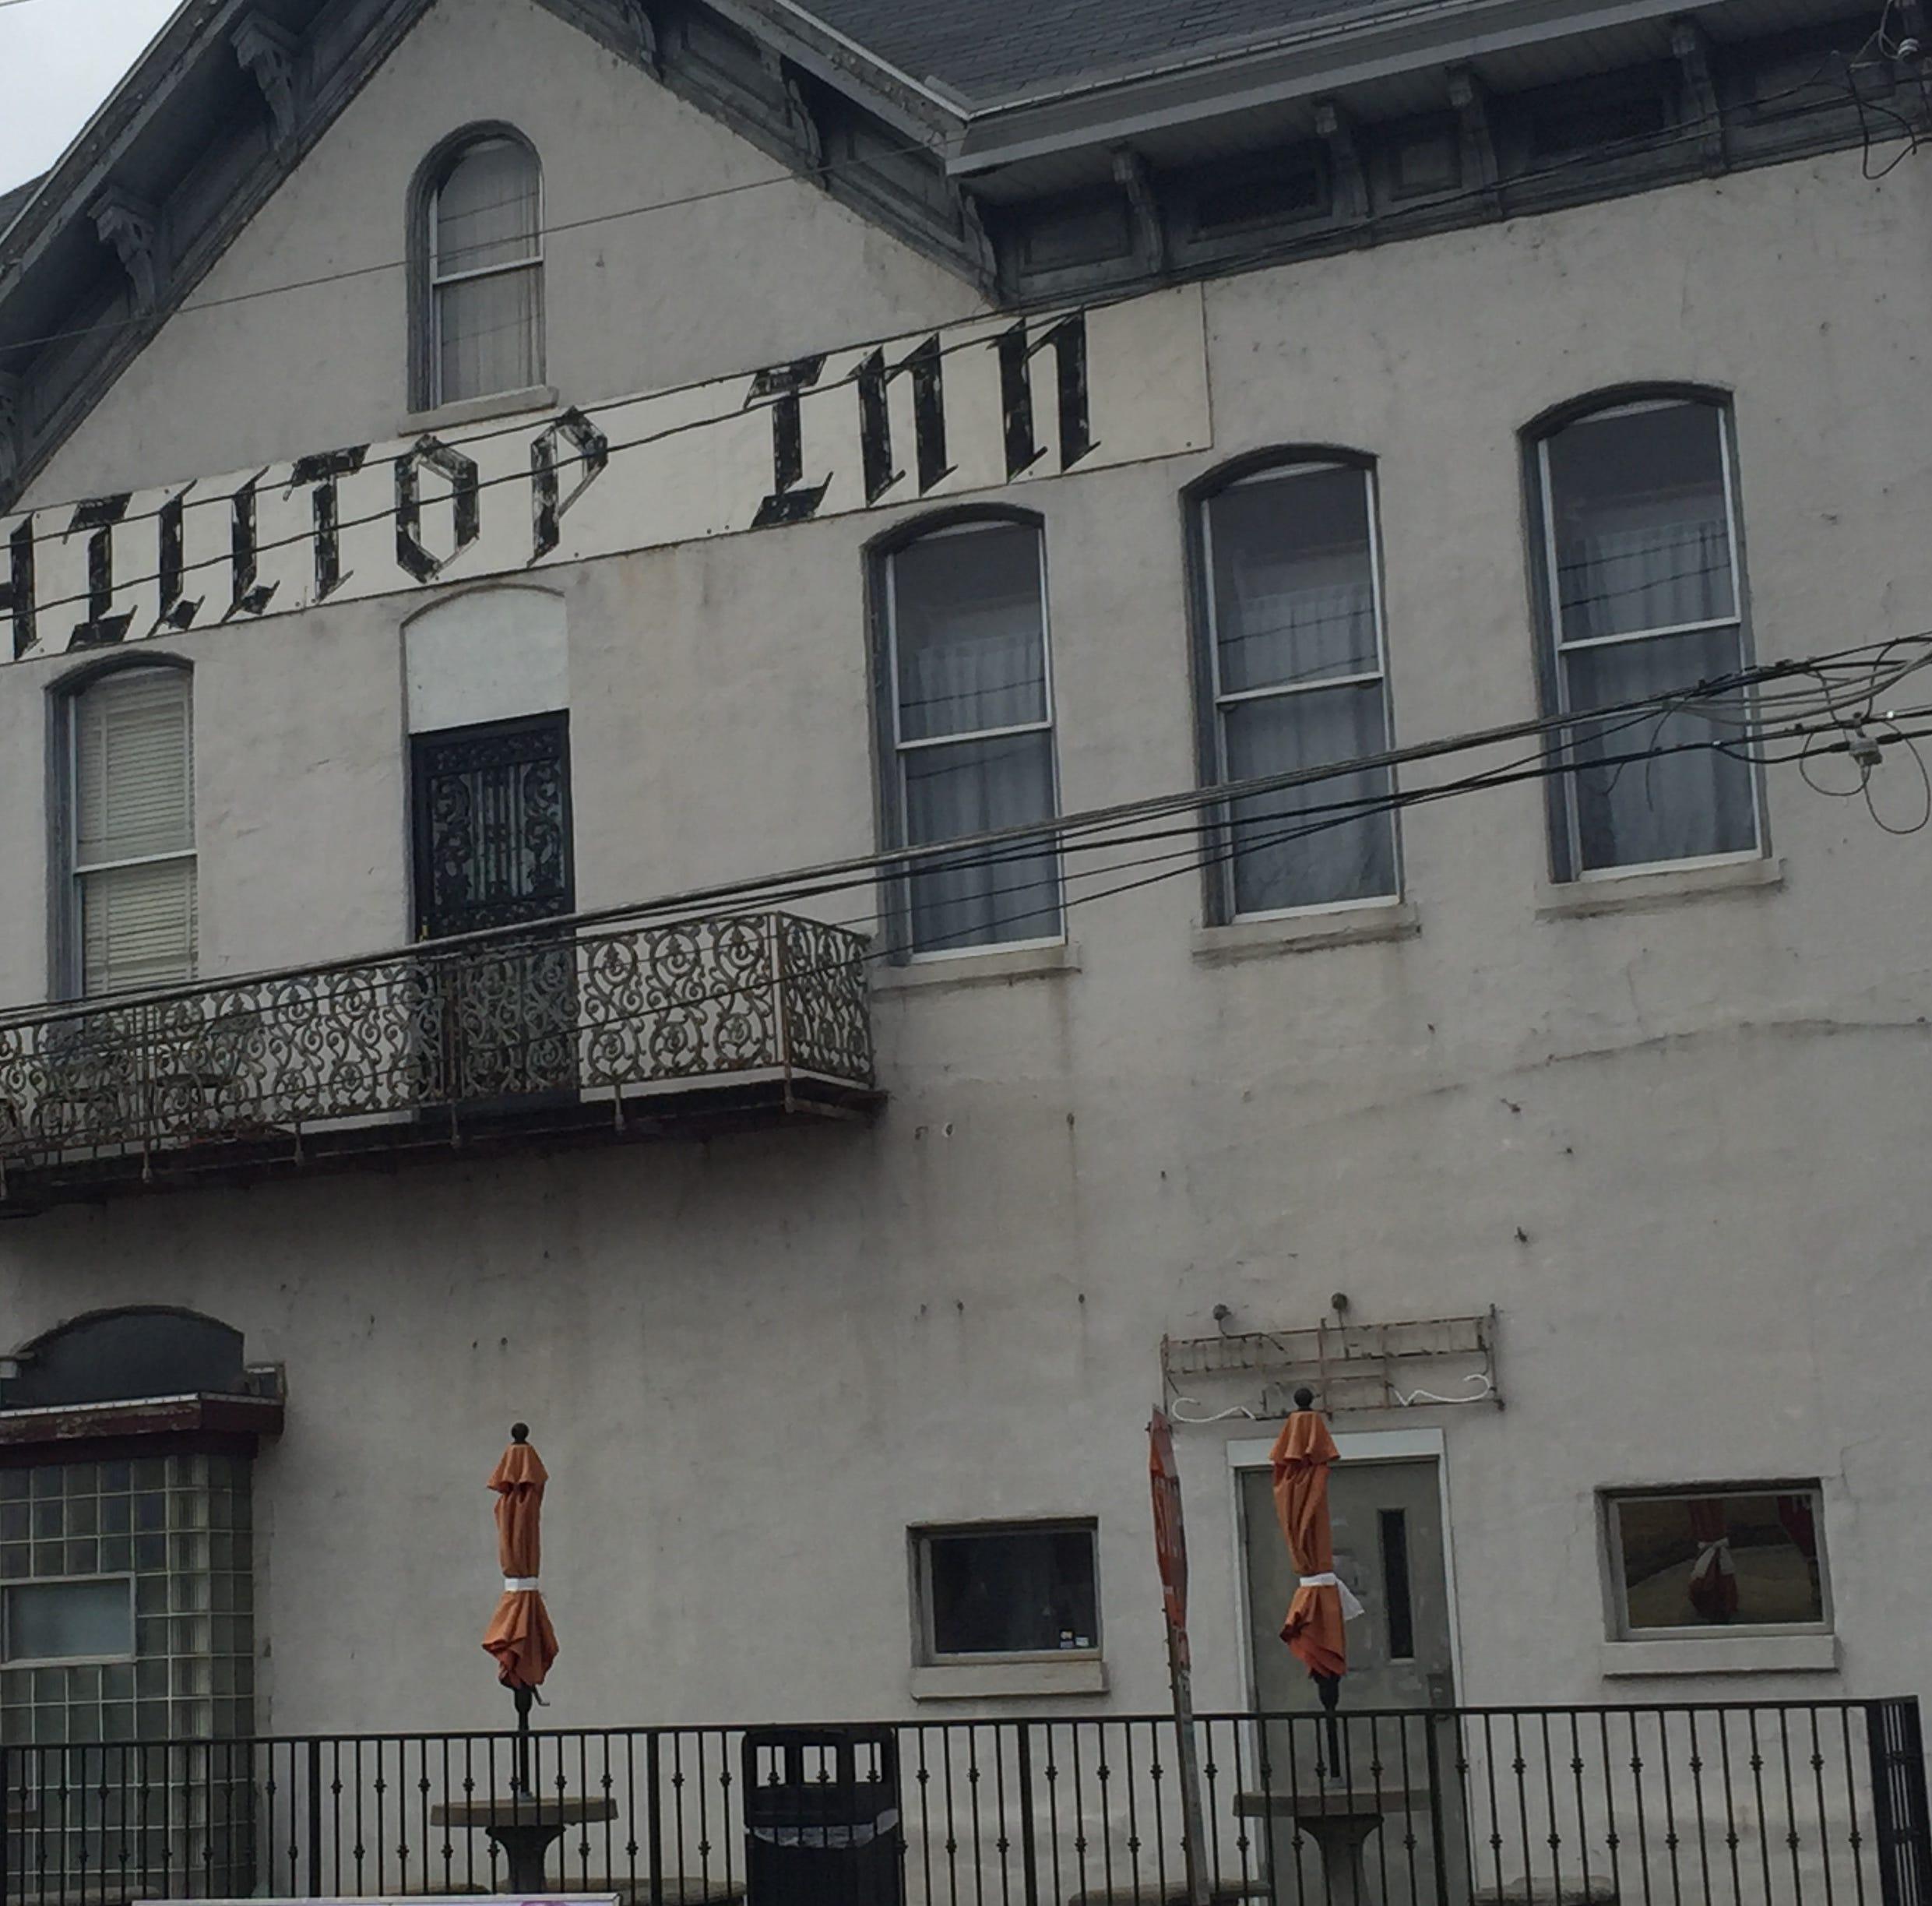 Marx Barbecue on Evansville's West Side now owns next-door Hilltop Inn